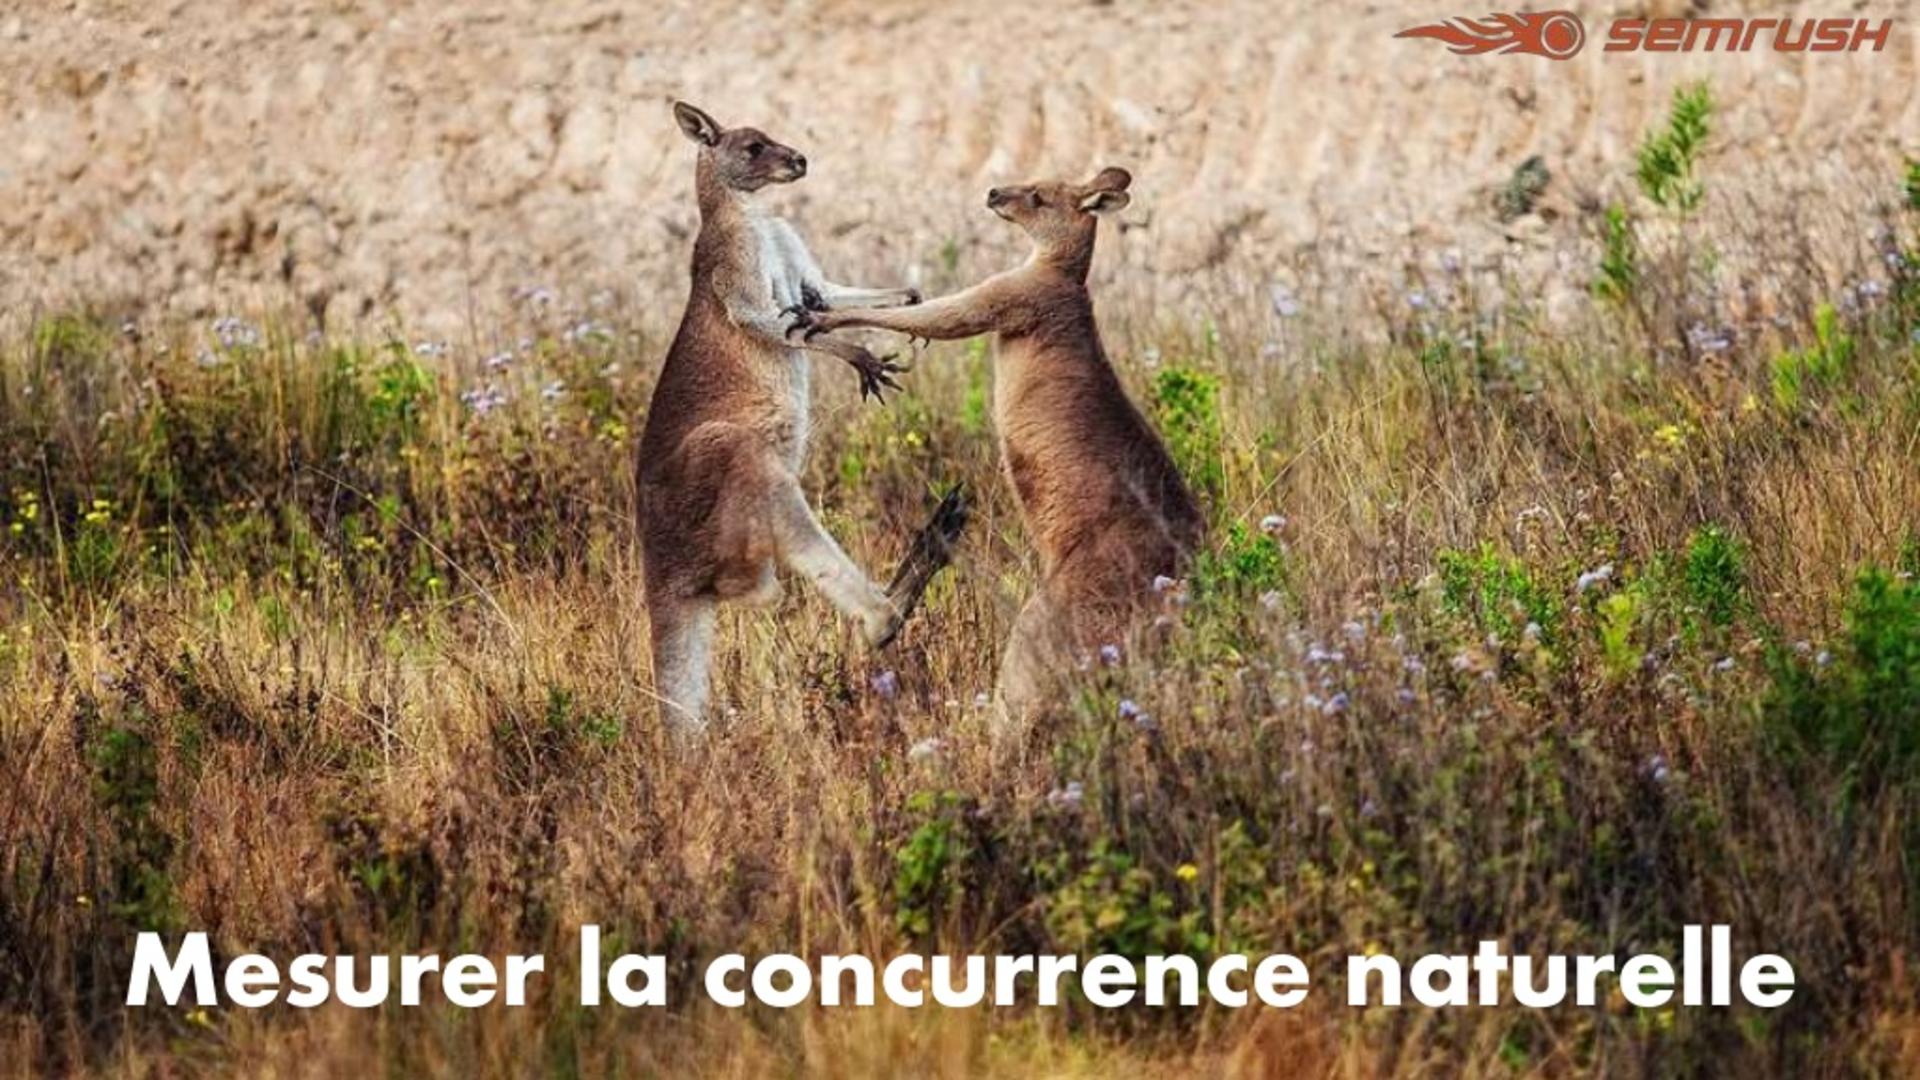 Mesurer la concurrence naturelle